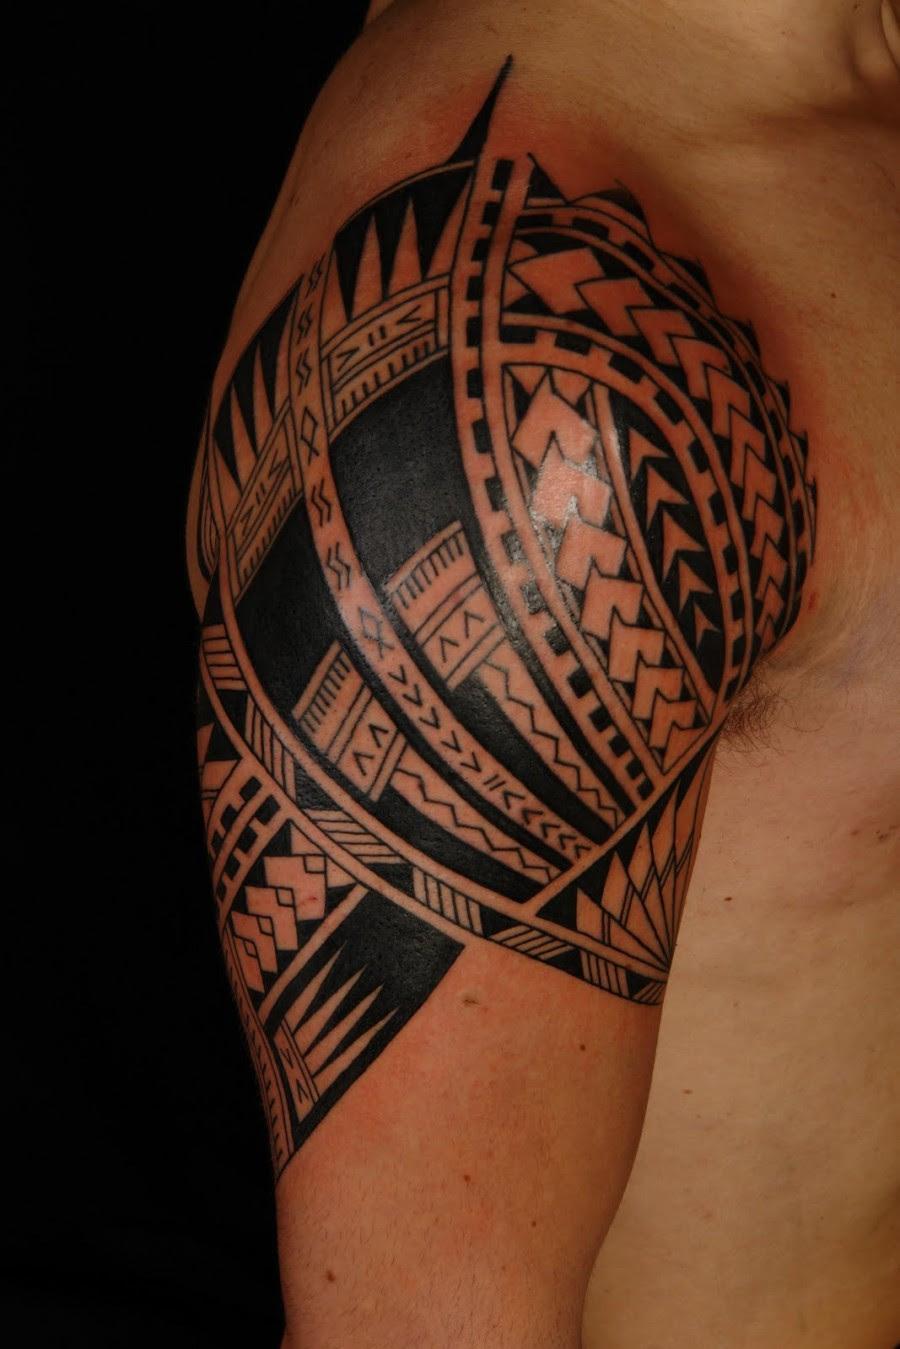 Awesome Samoan Sleeve Tatto On Upper Arm Tattoomagz